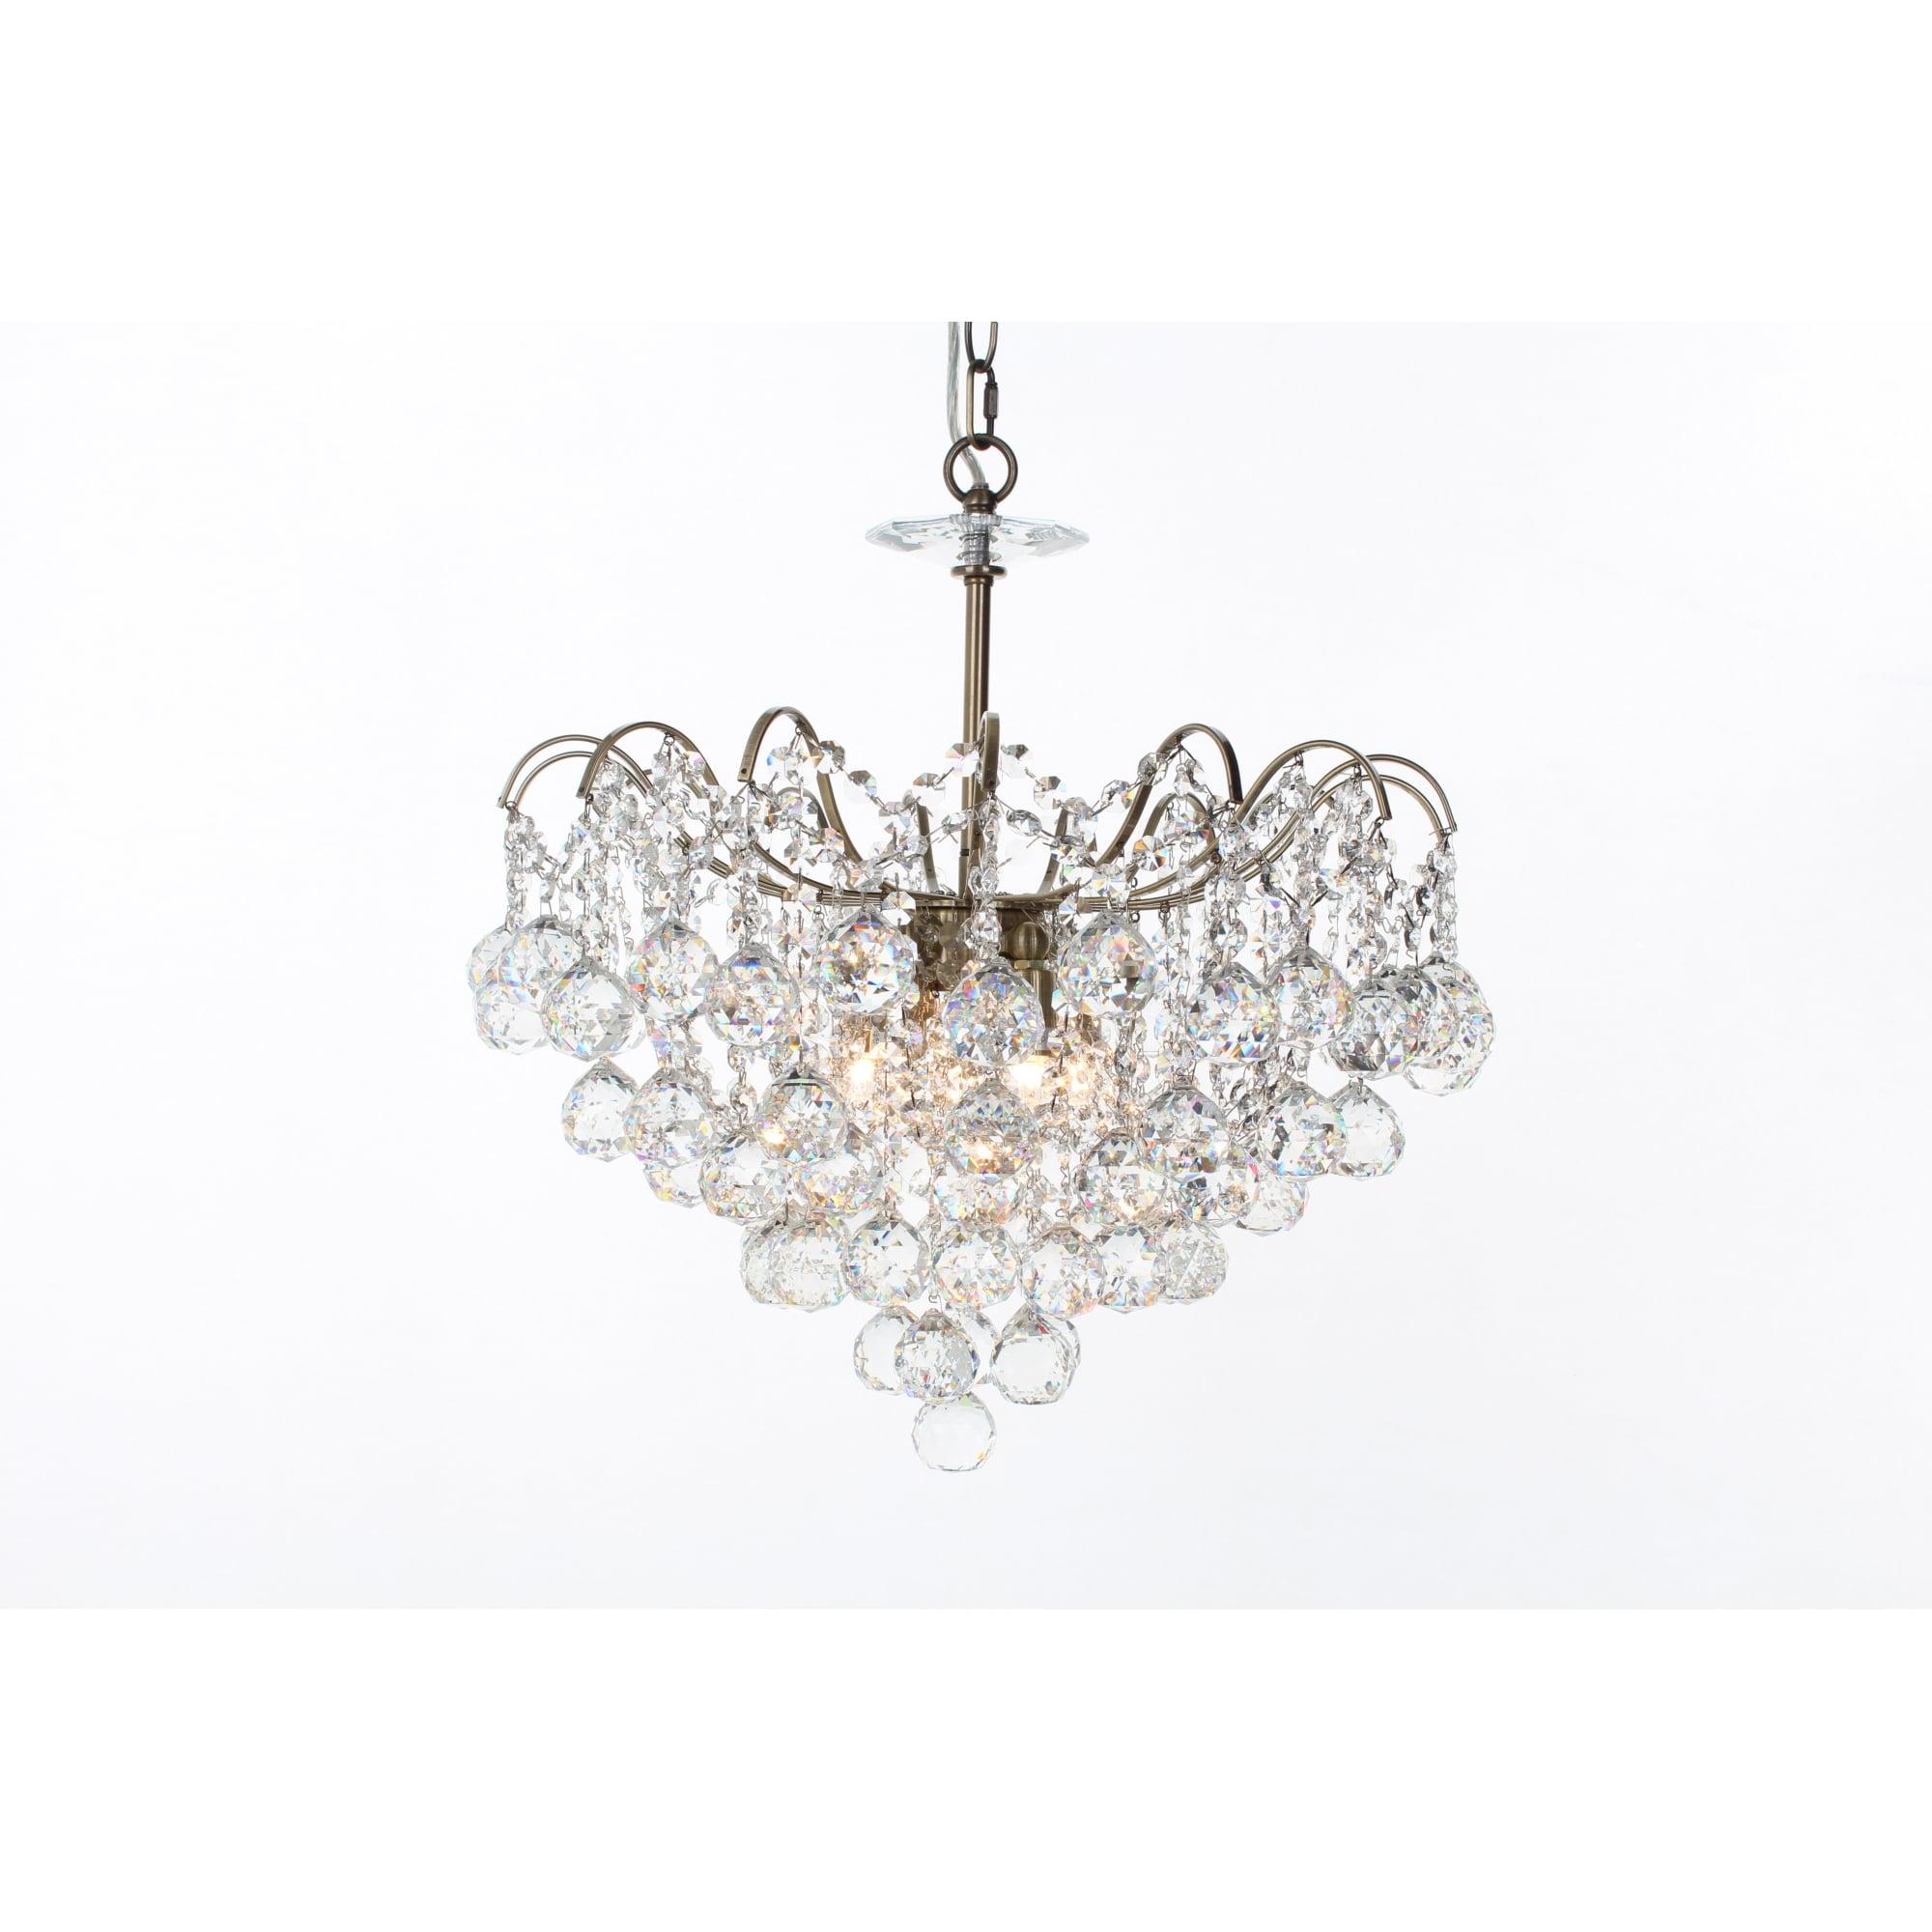 Buy Imperia Crystal 5 Bulb Chandelier